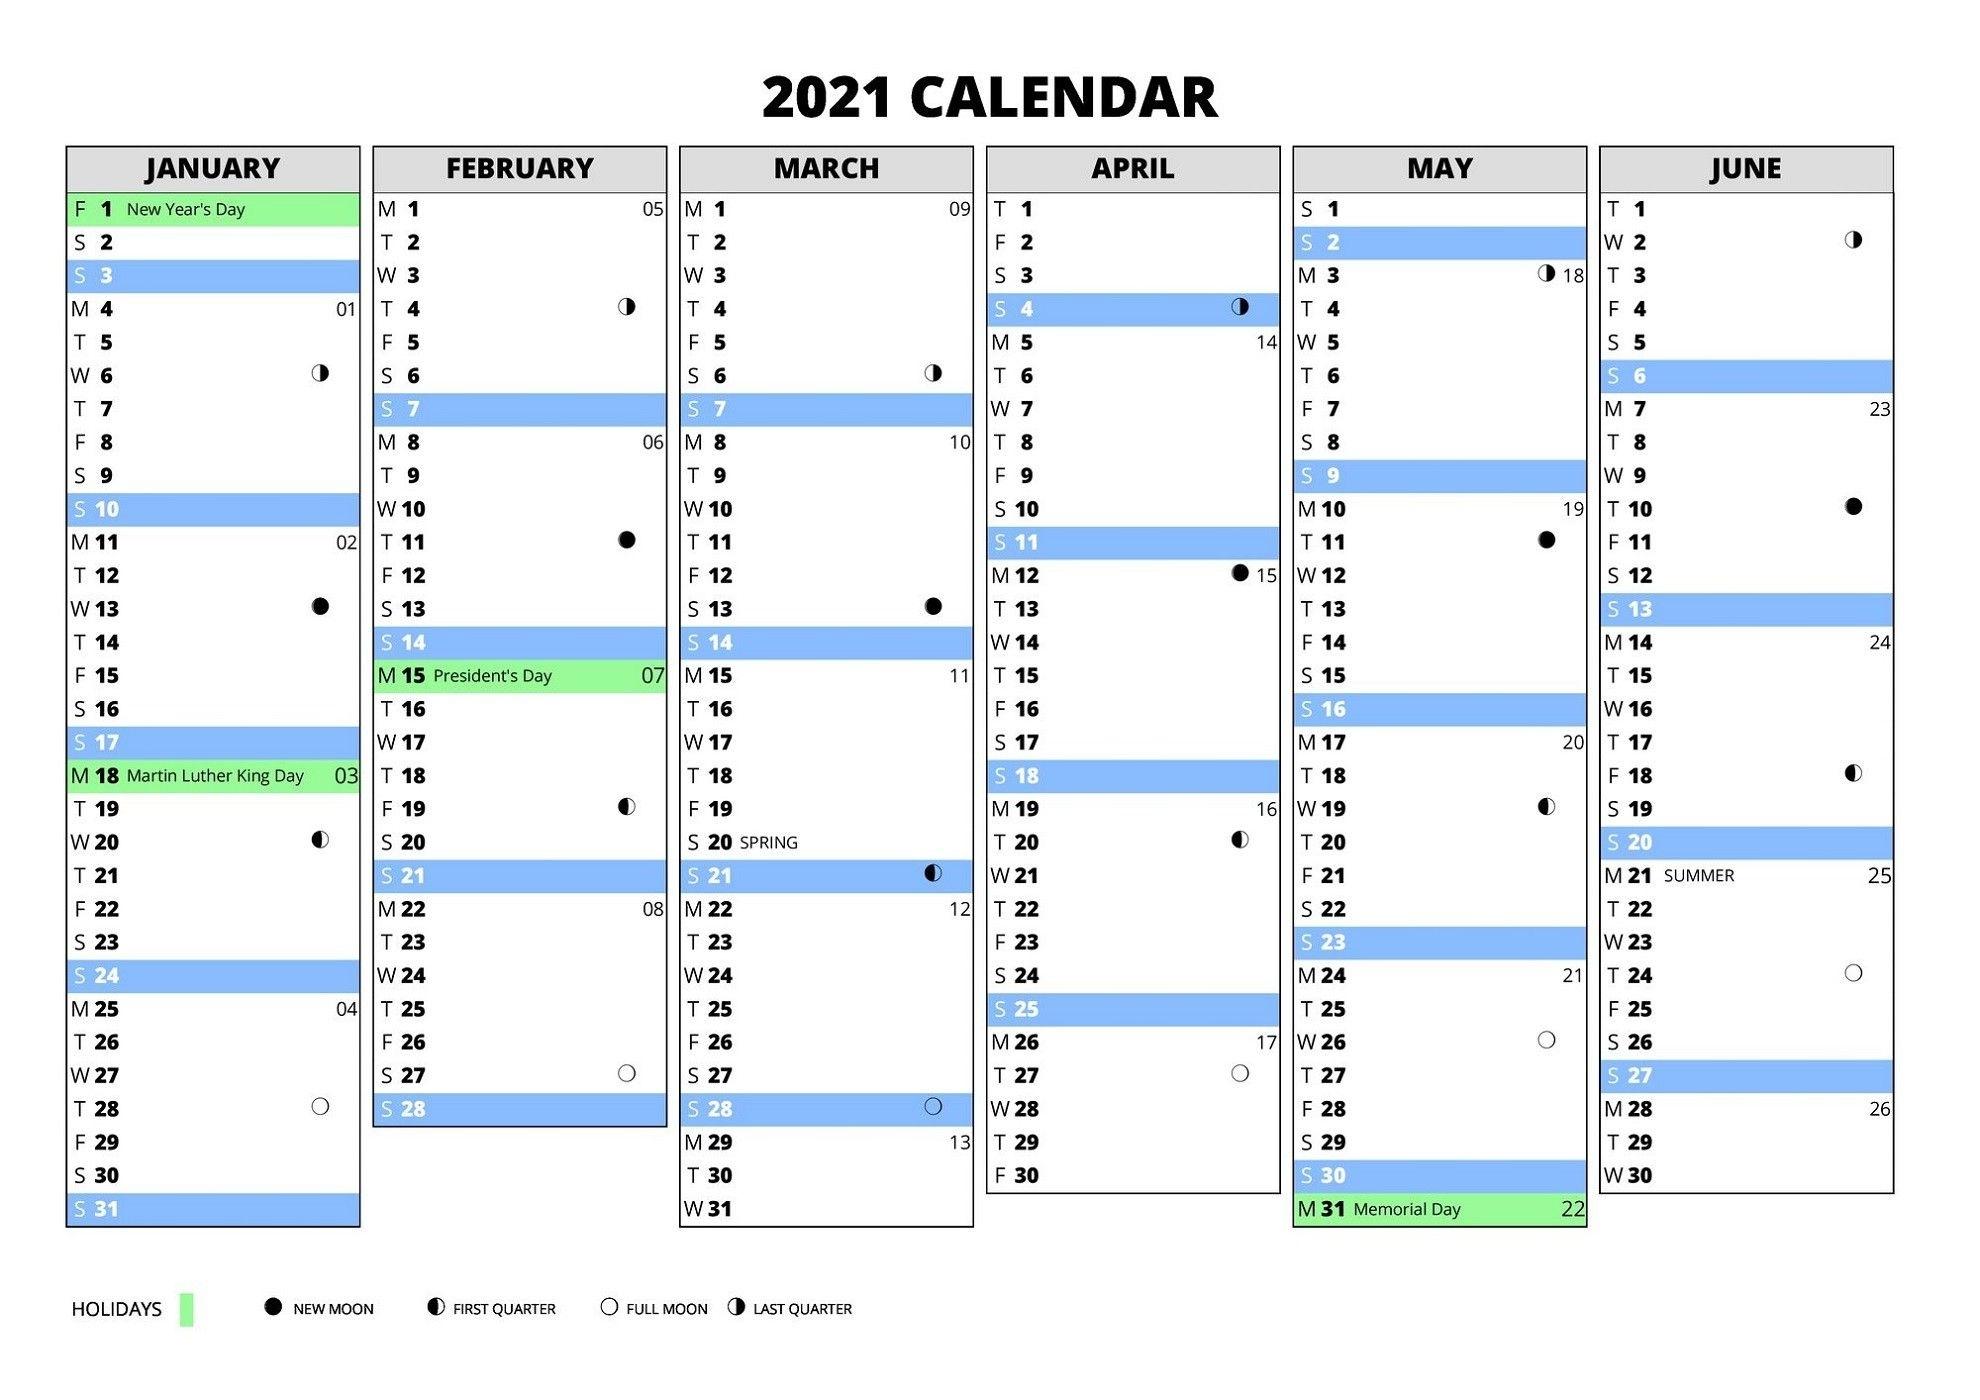 Collect Calendar Weeks 2021 Excel